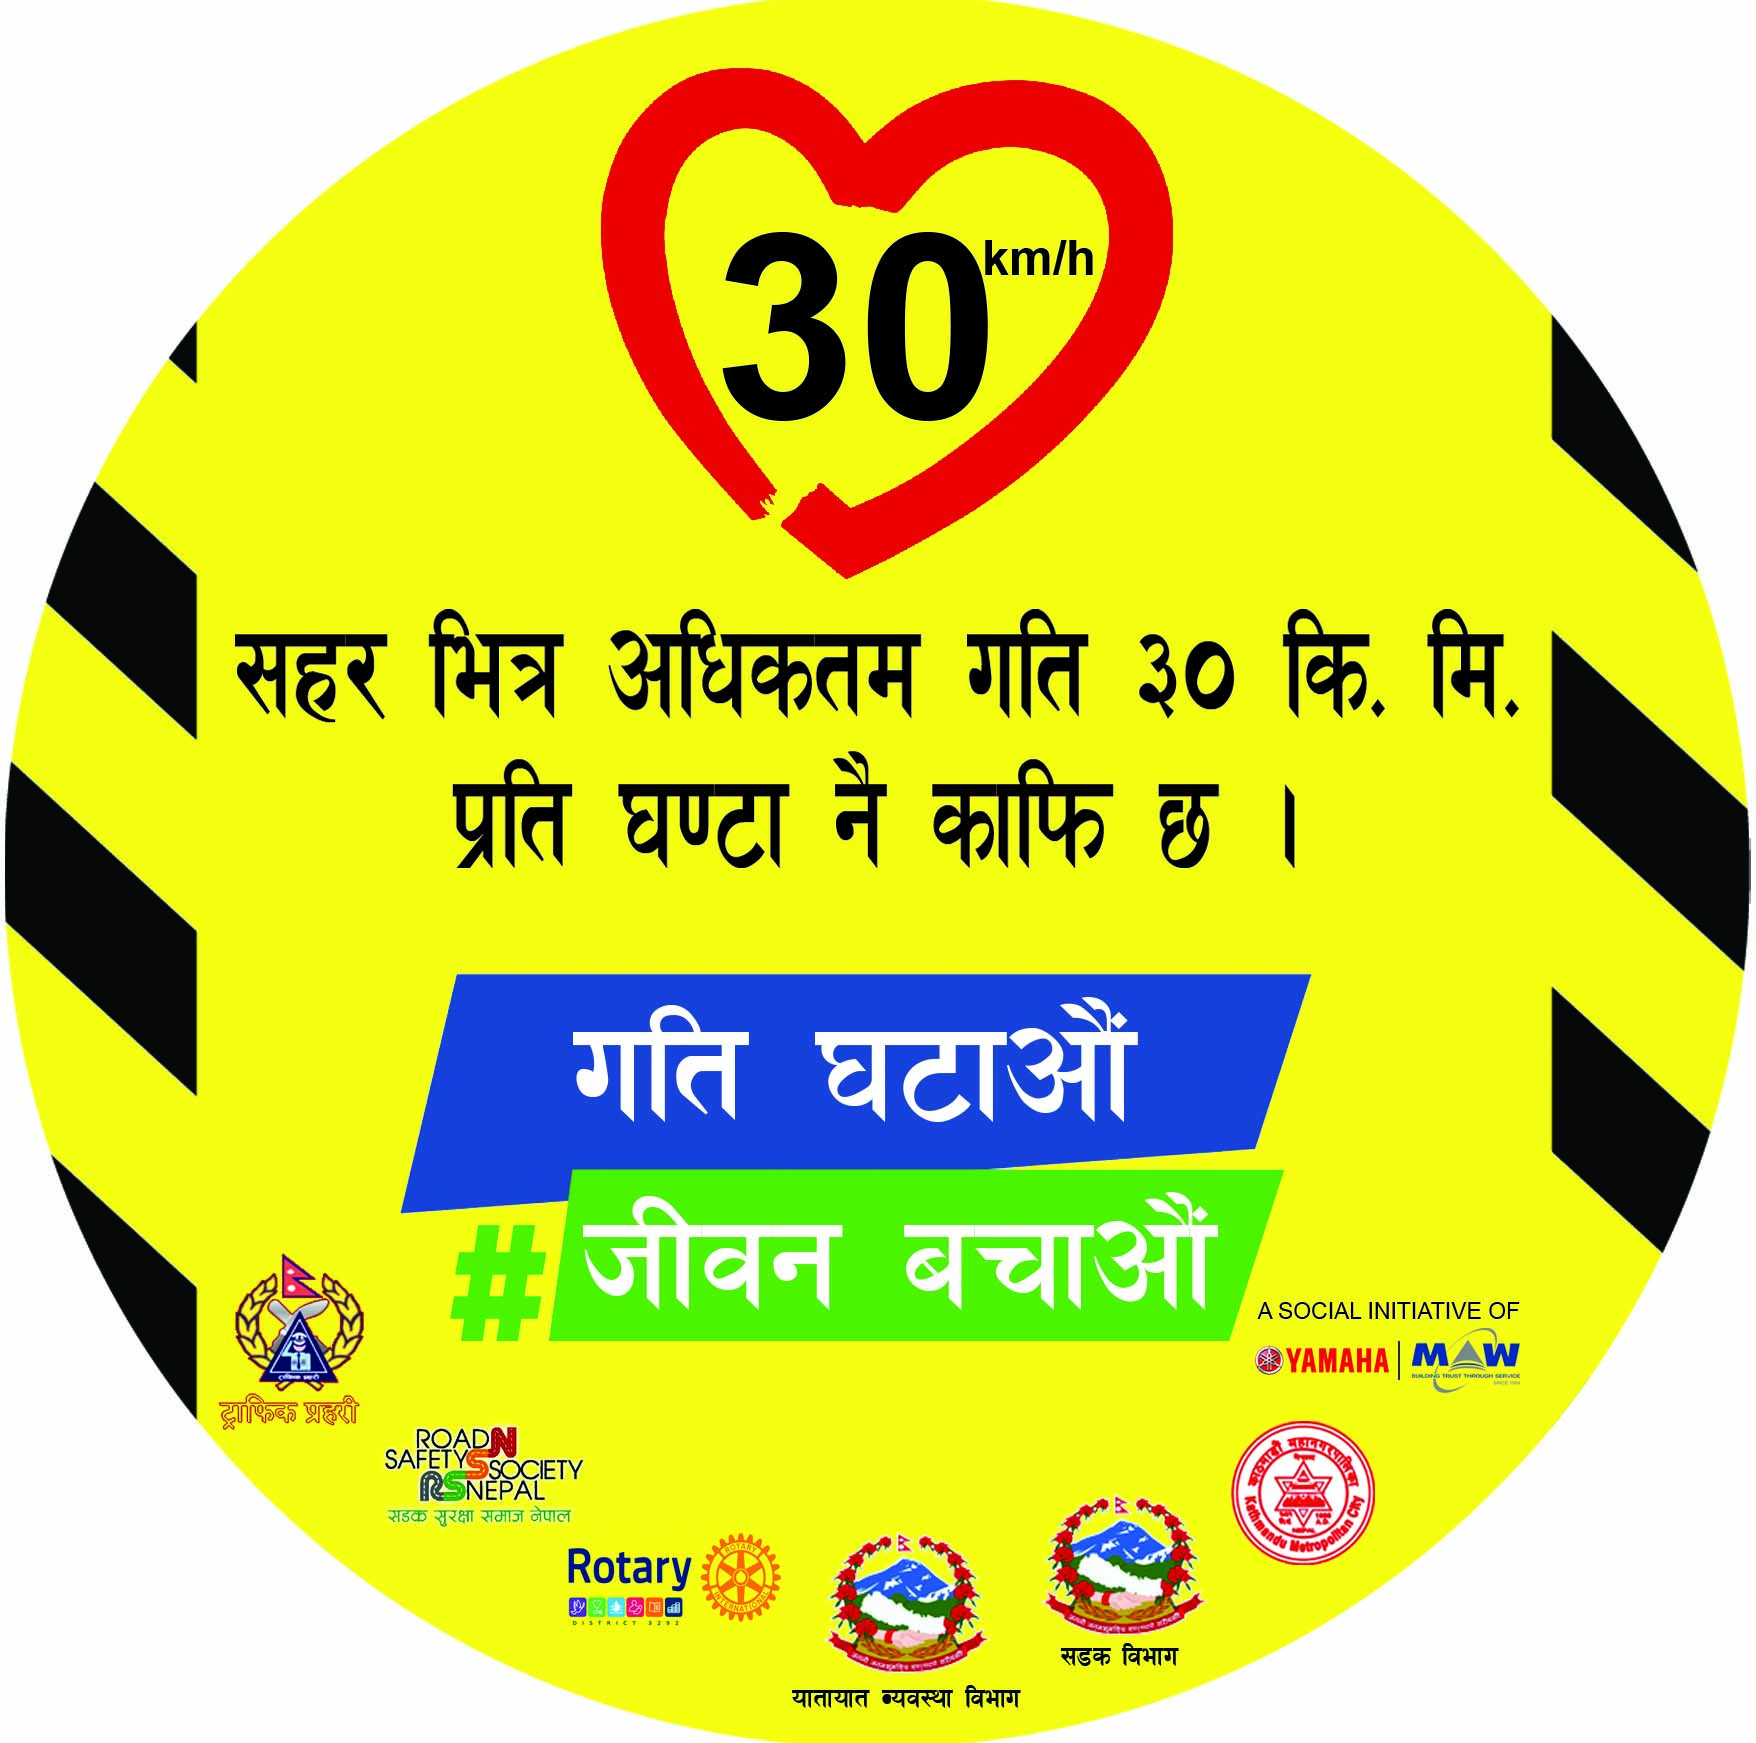 4th-UN-Global-Road-Safety-Week-2017-Traffic-Awareness-Program-Rotary-club-of-Kakarvitta-56